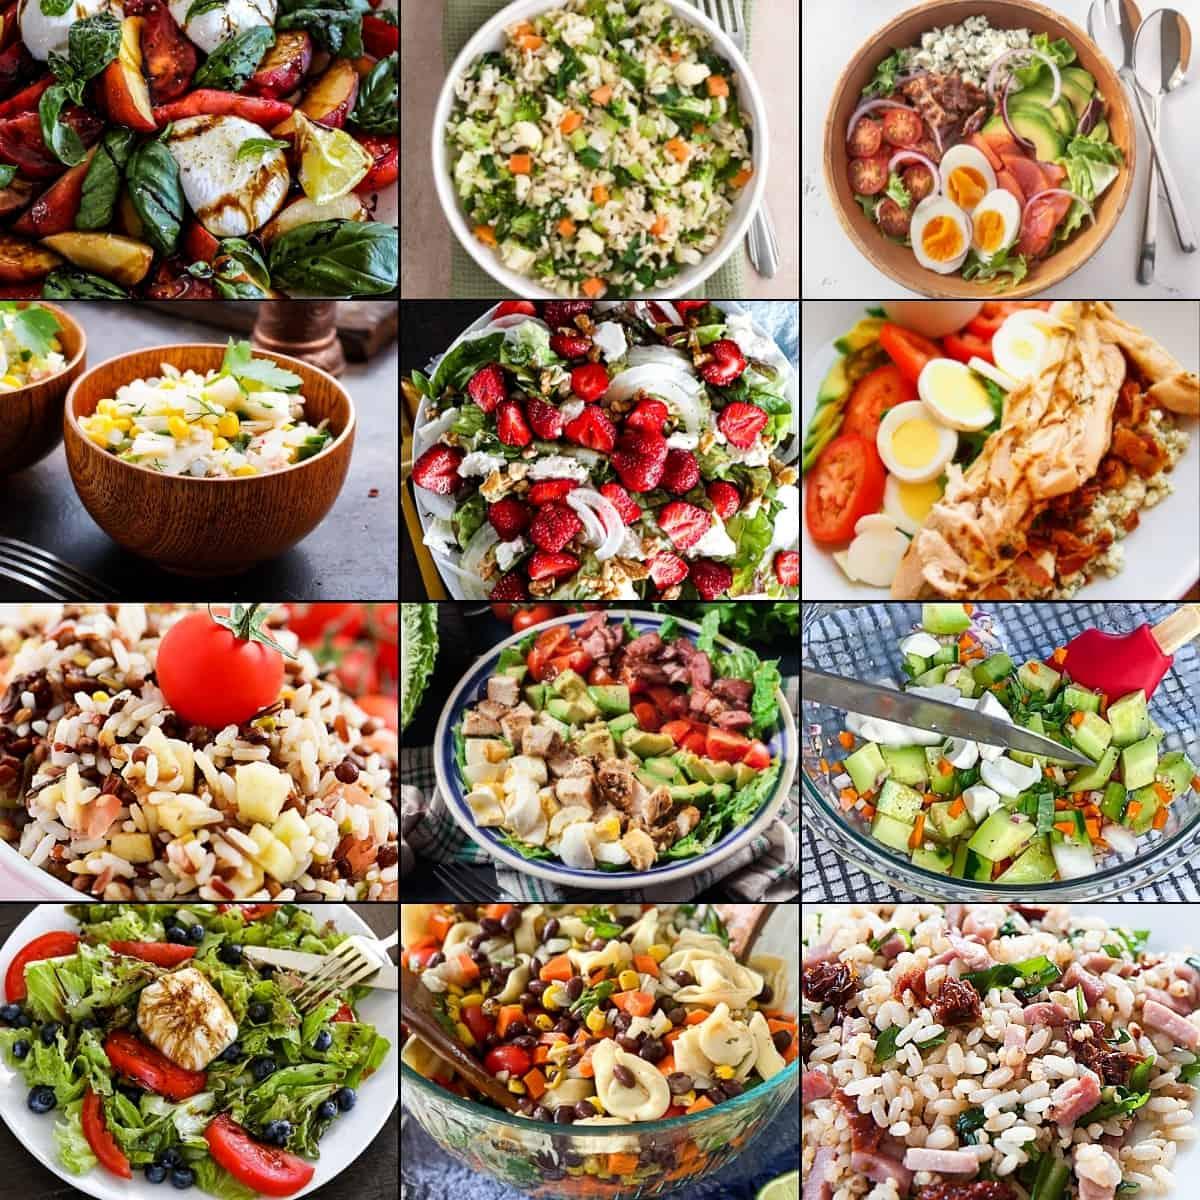 Summer salad recipe ideas collage